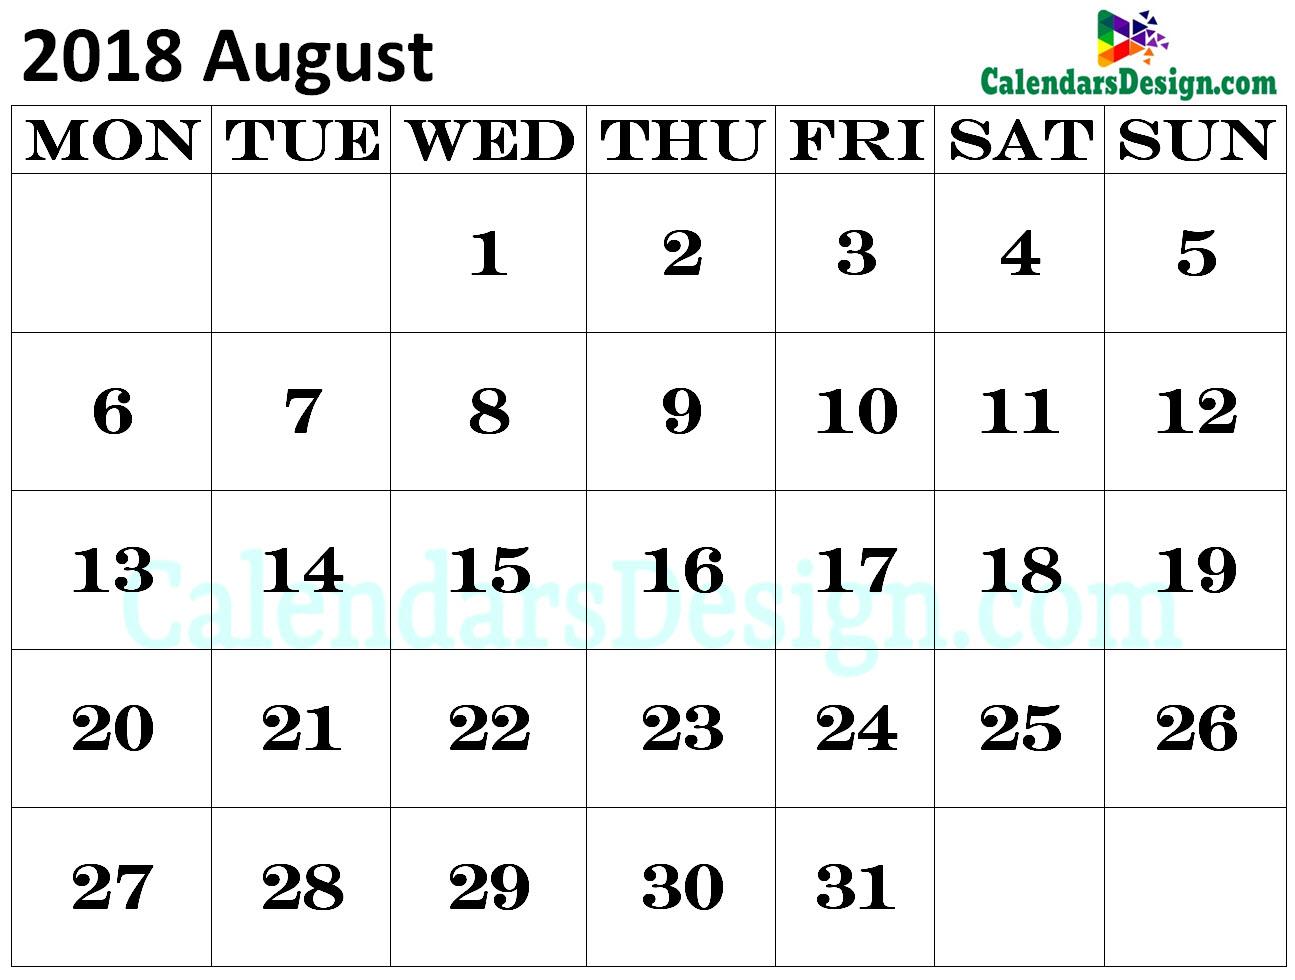 2018 calendar august excel calendar for august 2018 excel